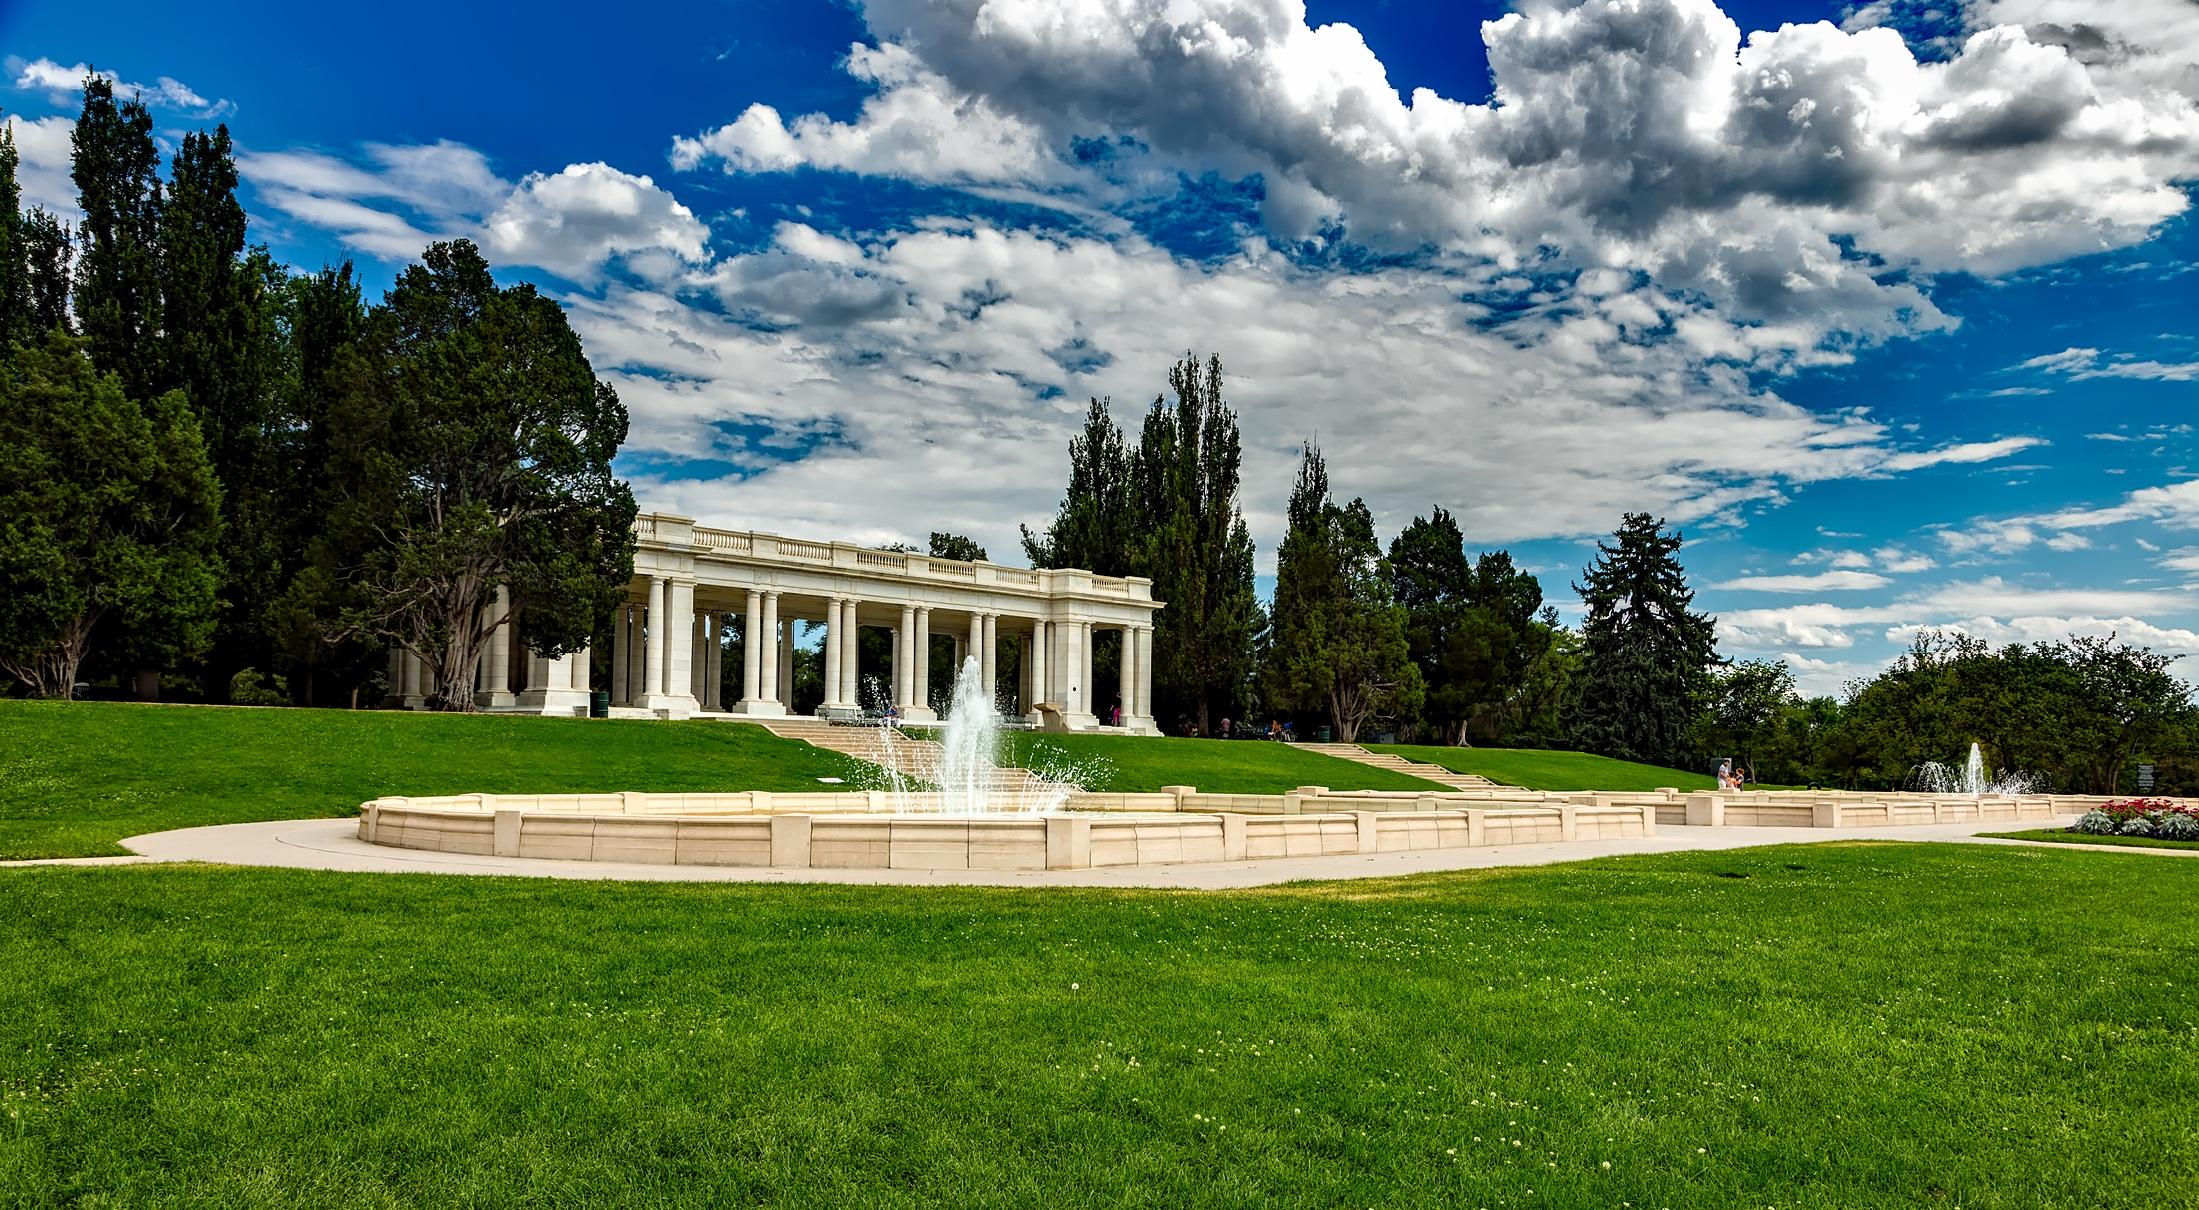 Free stock photo of landscape, sky, landmark, clouds